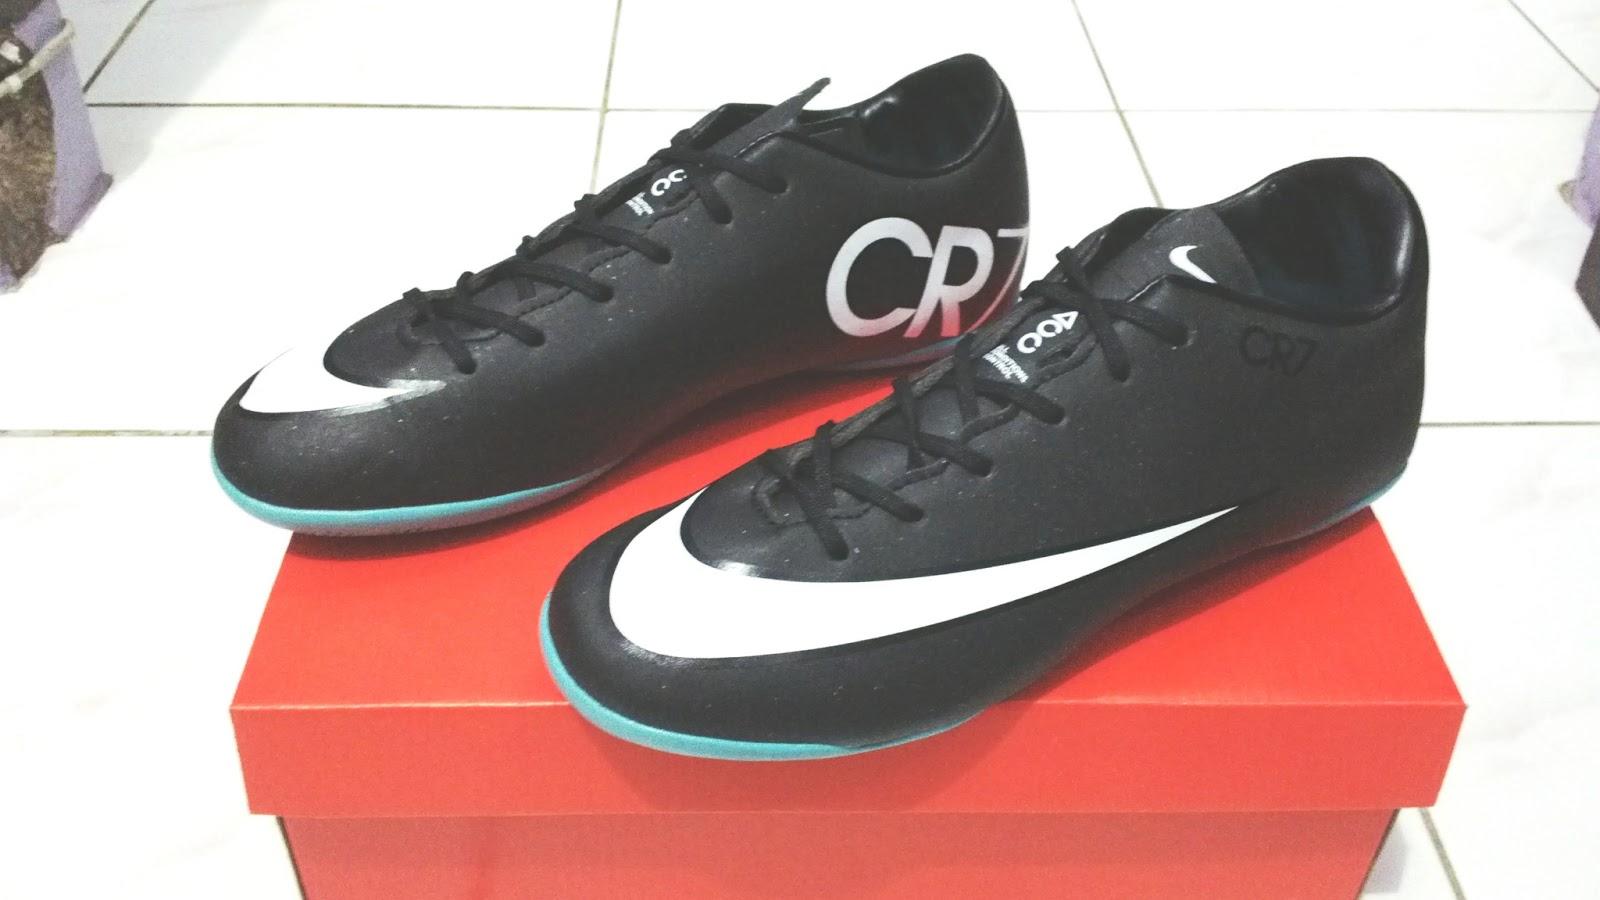 c280acc4c ... new style sepatu futsal nike 082370086410. nike mercurial vapor x e9c5f  9f047 ...